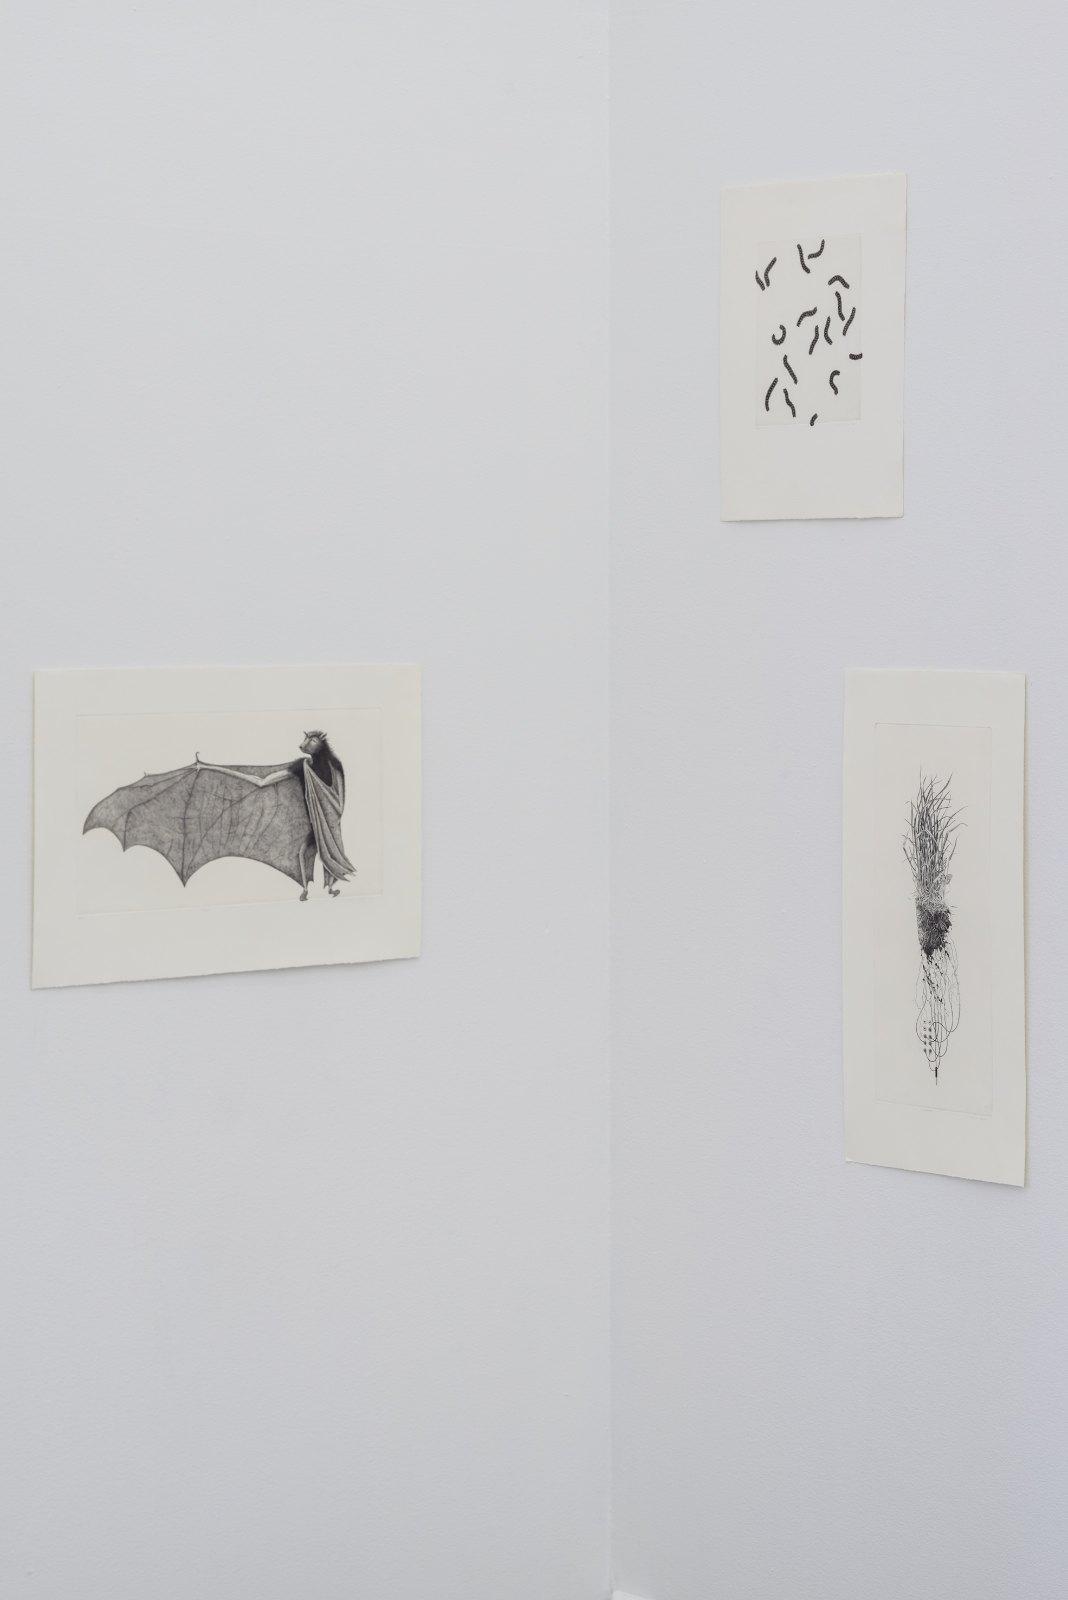 Ulla Fries, Filosofen, 2000, Copperplate engraving, 25 x 49 cm, Ed. 90. Larver, 1982, copperplate engraving, 24,5 x 19 cm, Ed. 90. Jordmodem, 1997, Copperplate engraving, 49 x 20,5 cm, Ed. 90